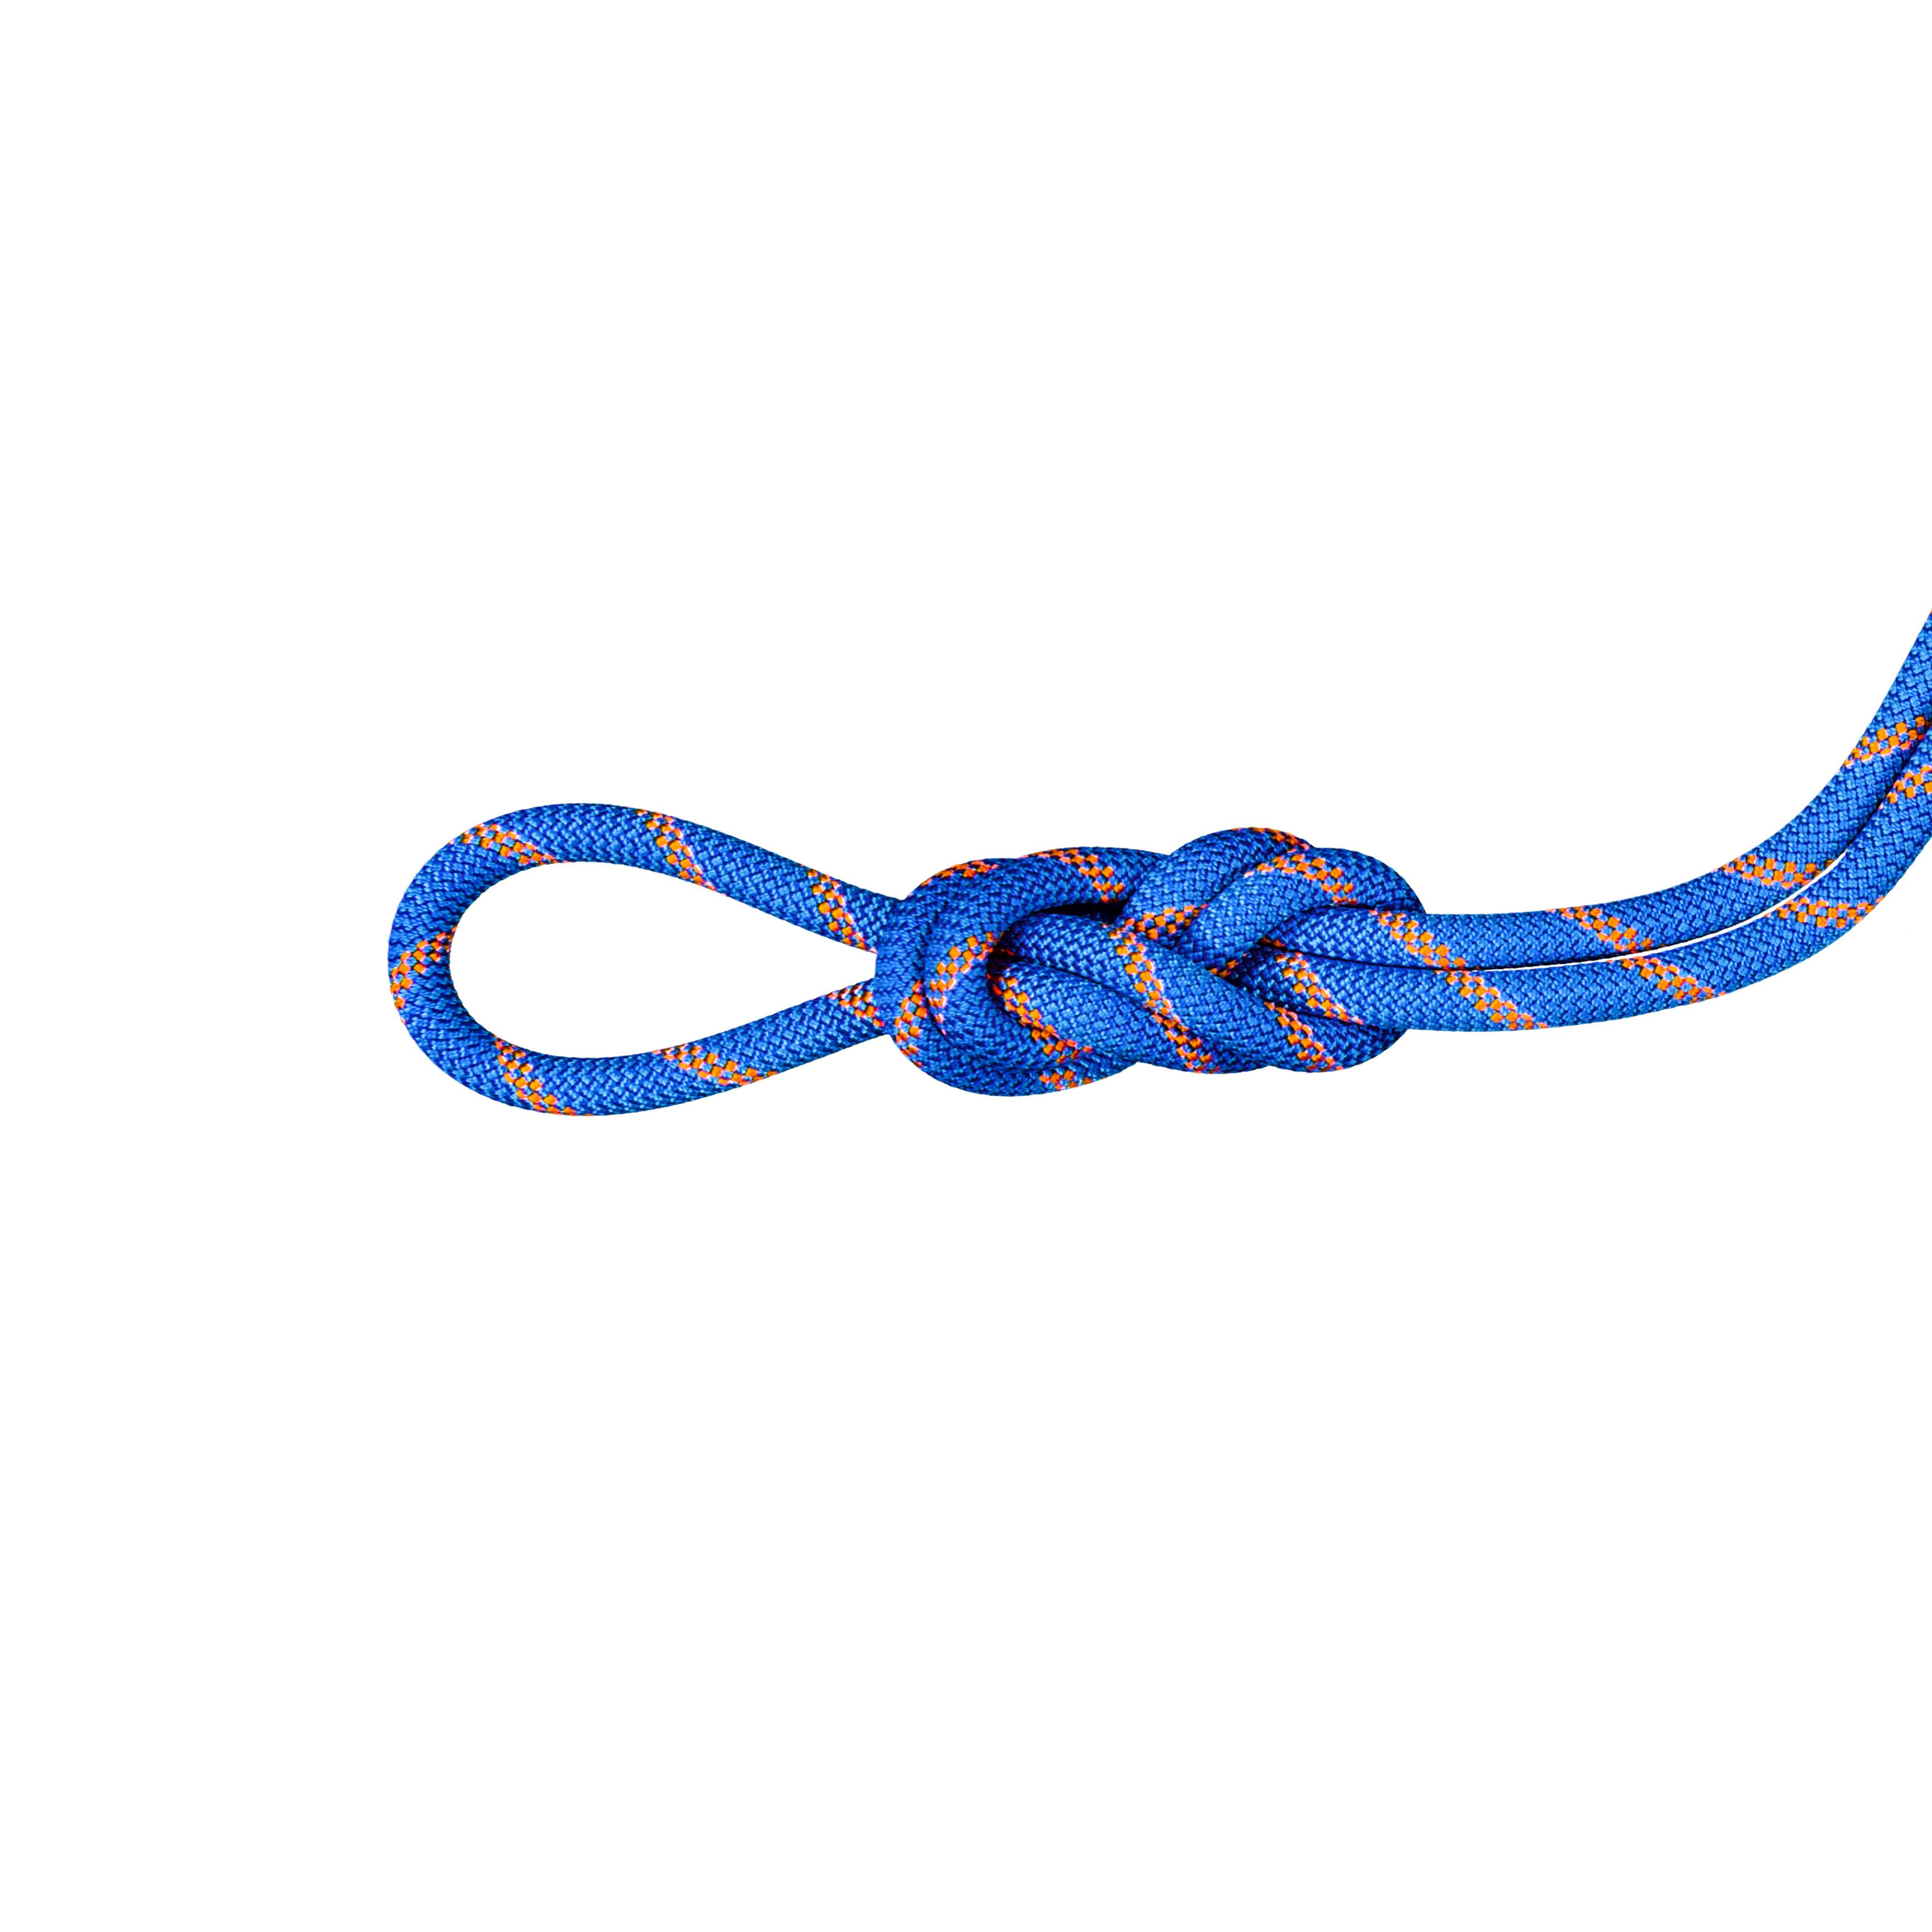 9.0 Alpine Sender Dry Rope - 50 m, Dry Standard, ice-sunrise thumbnail